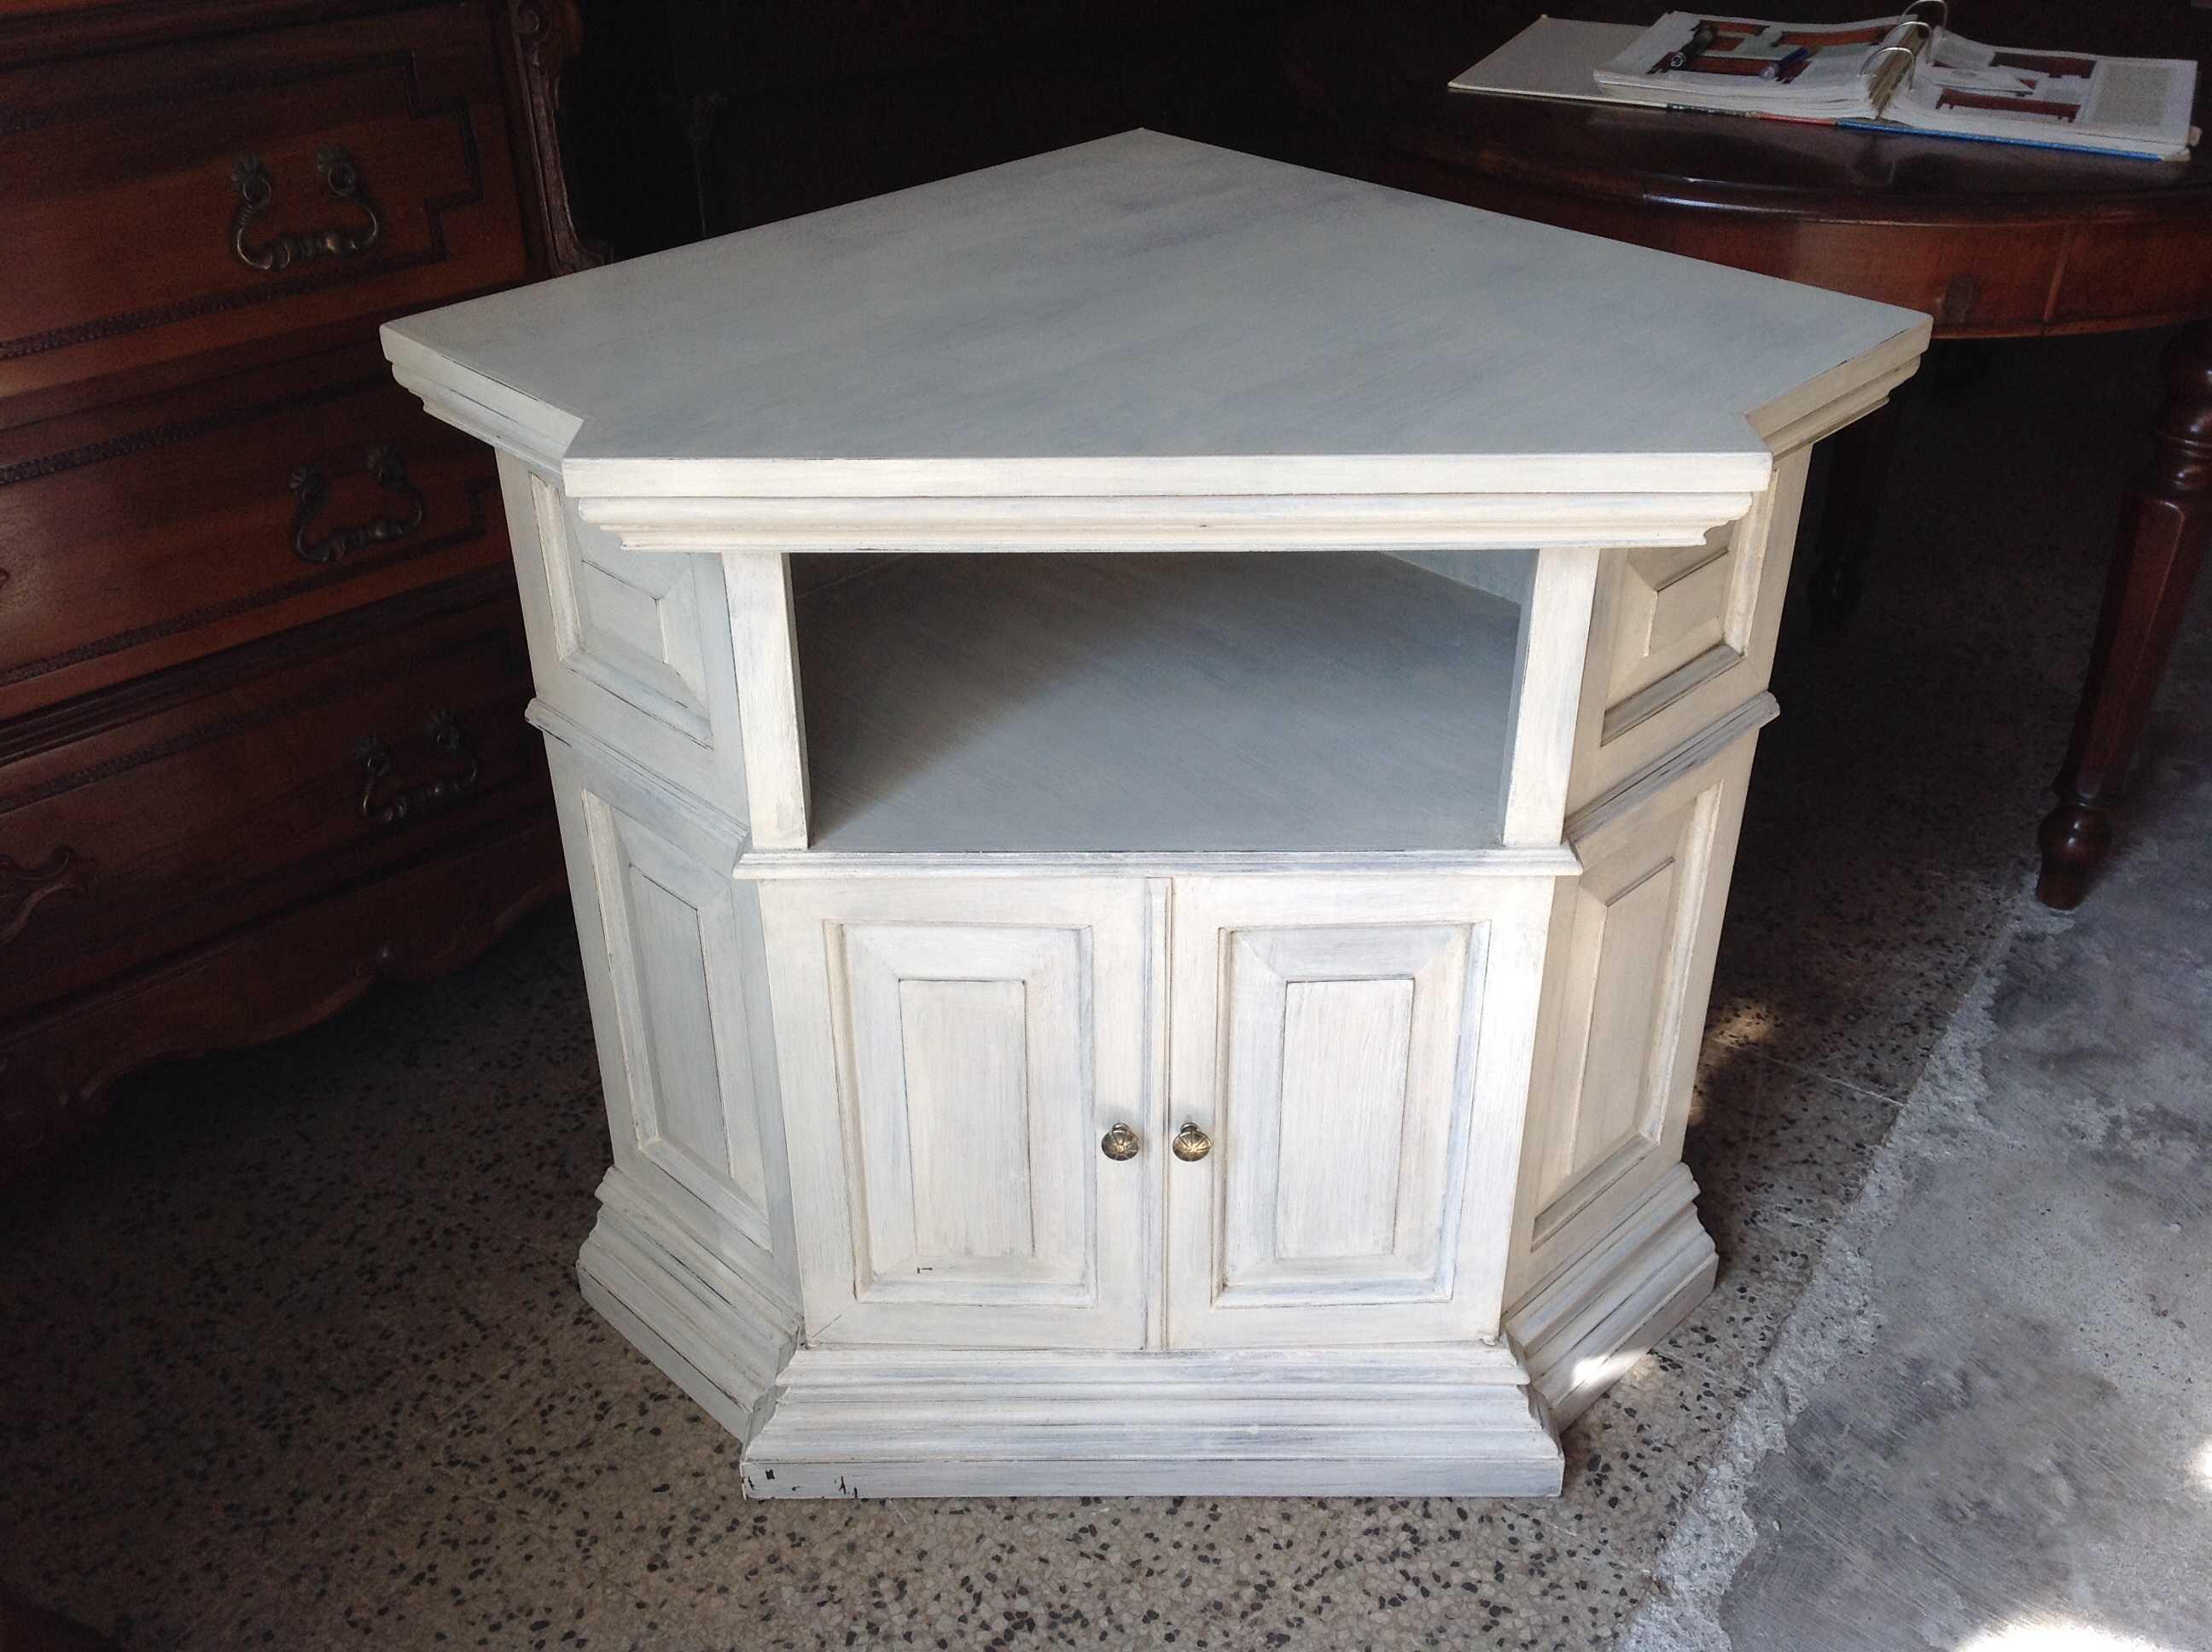 Angoliera shabby chic arredamento mobili antiquariato - Restaurare mobili shabby chic ...